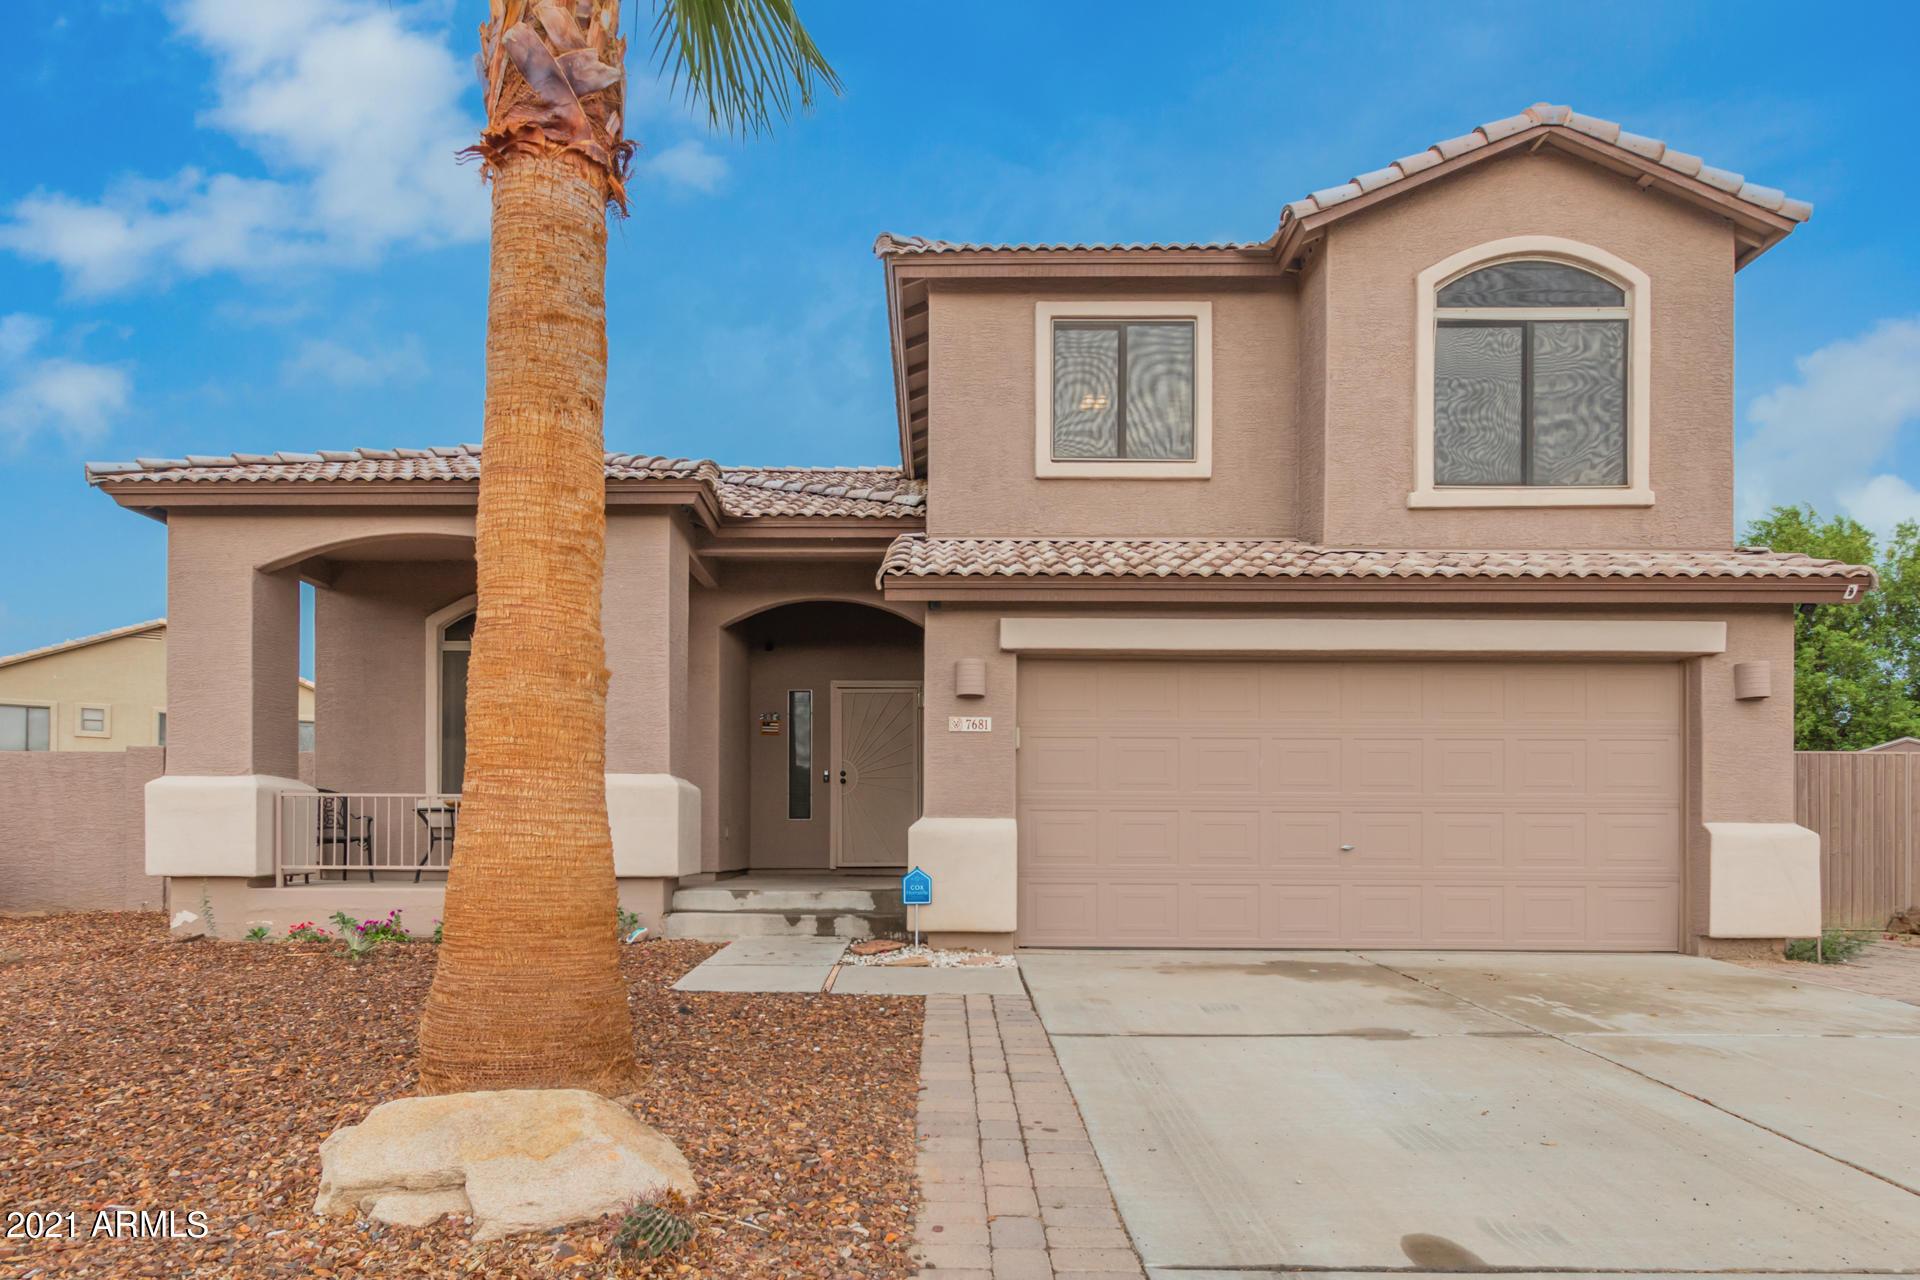 Residential For Sale Glendale